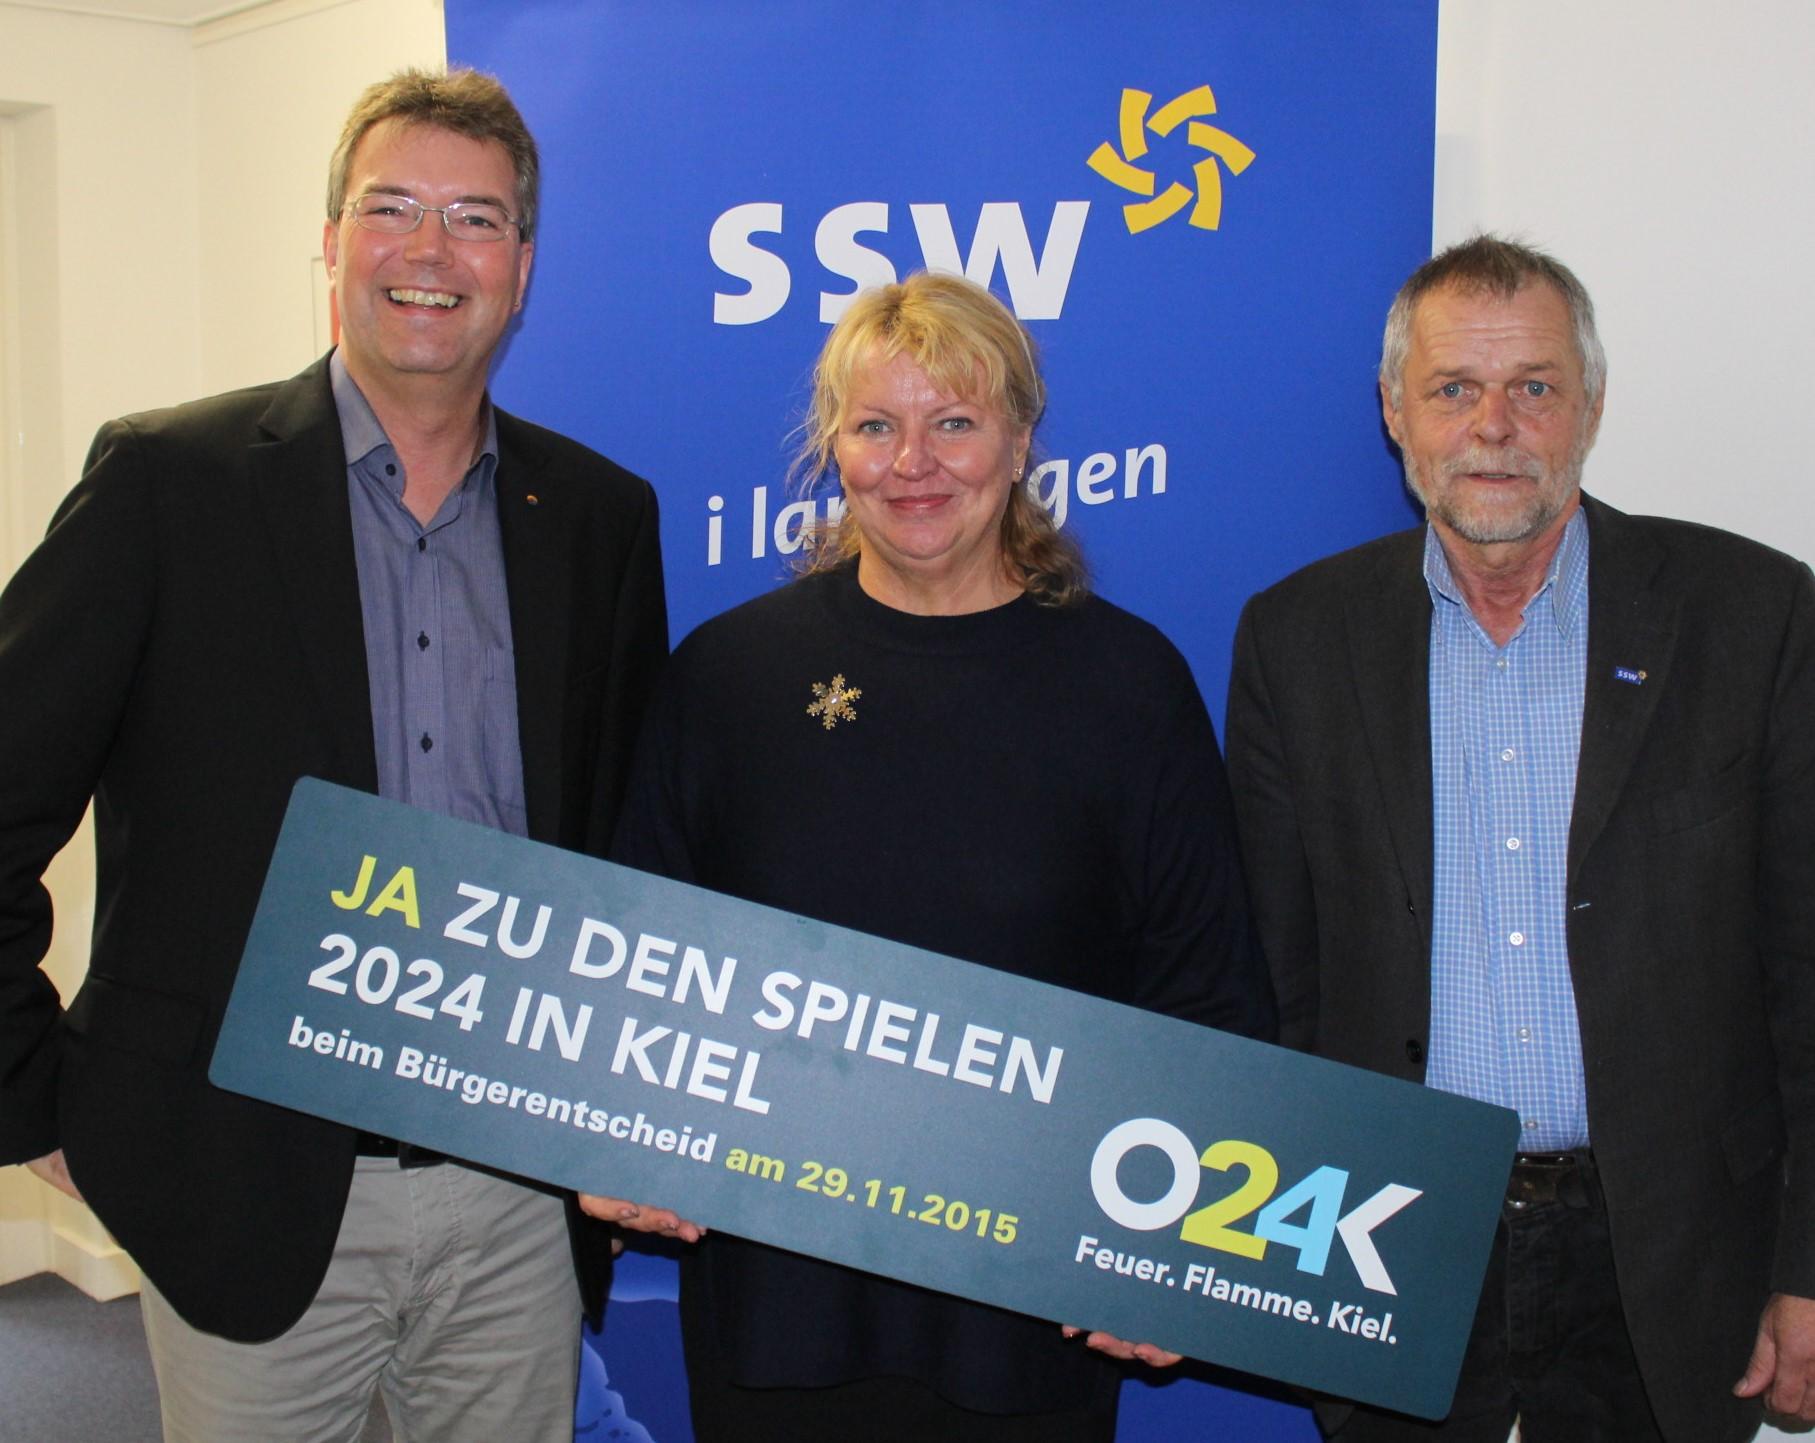 Lars Harms, Jette Waldinger-Thiering und Flemming Meyer